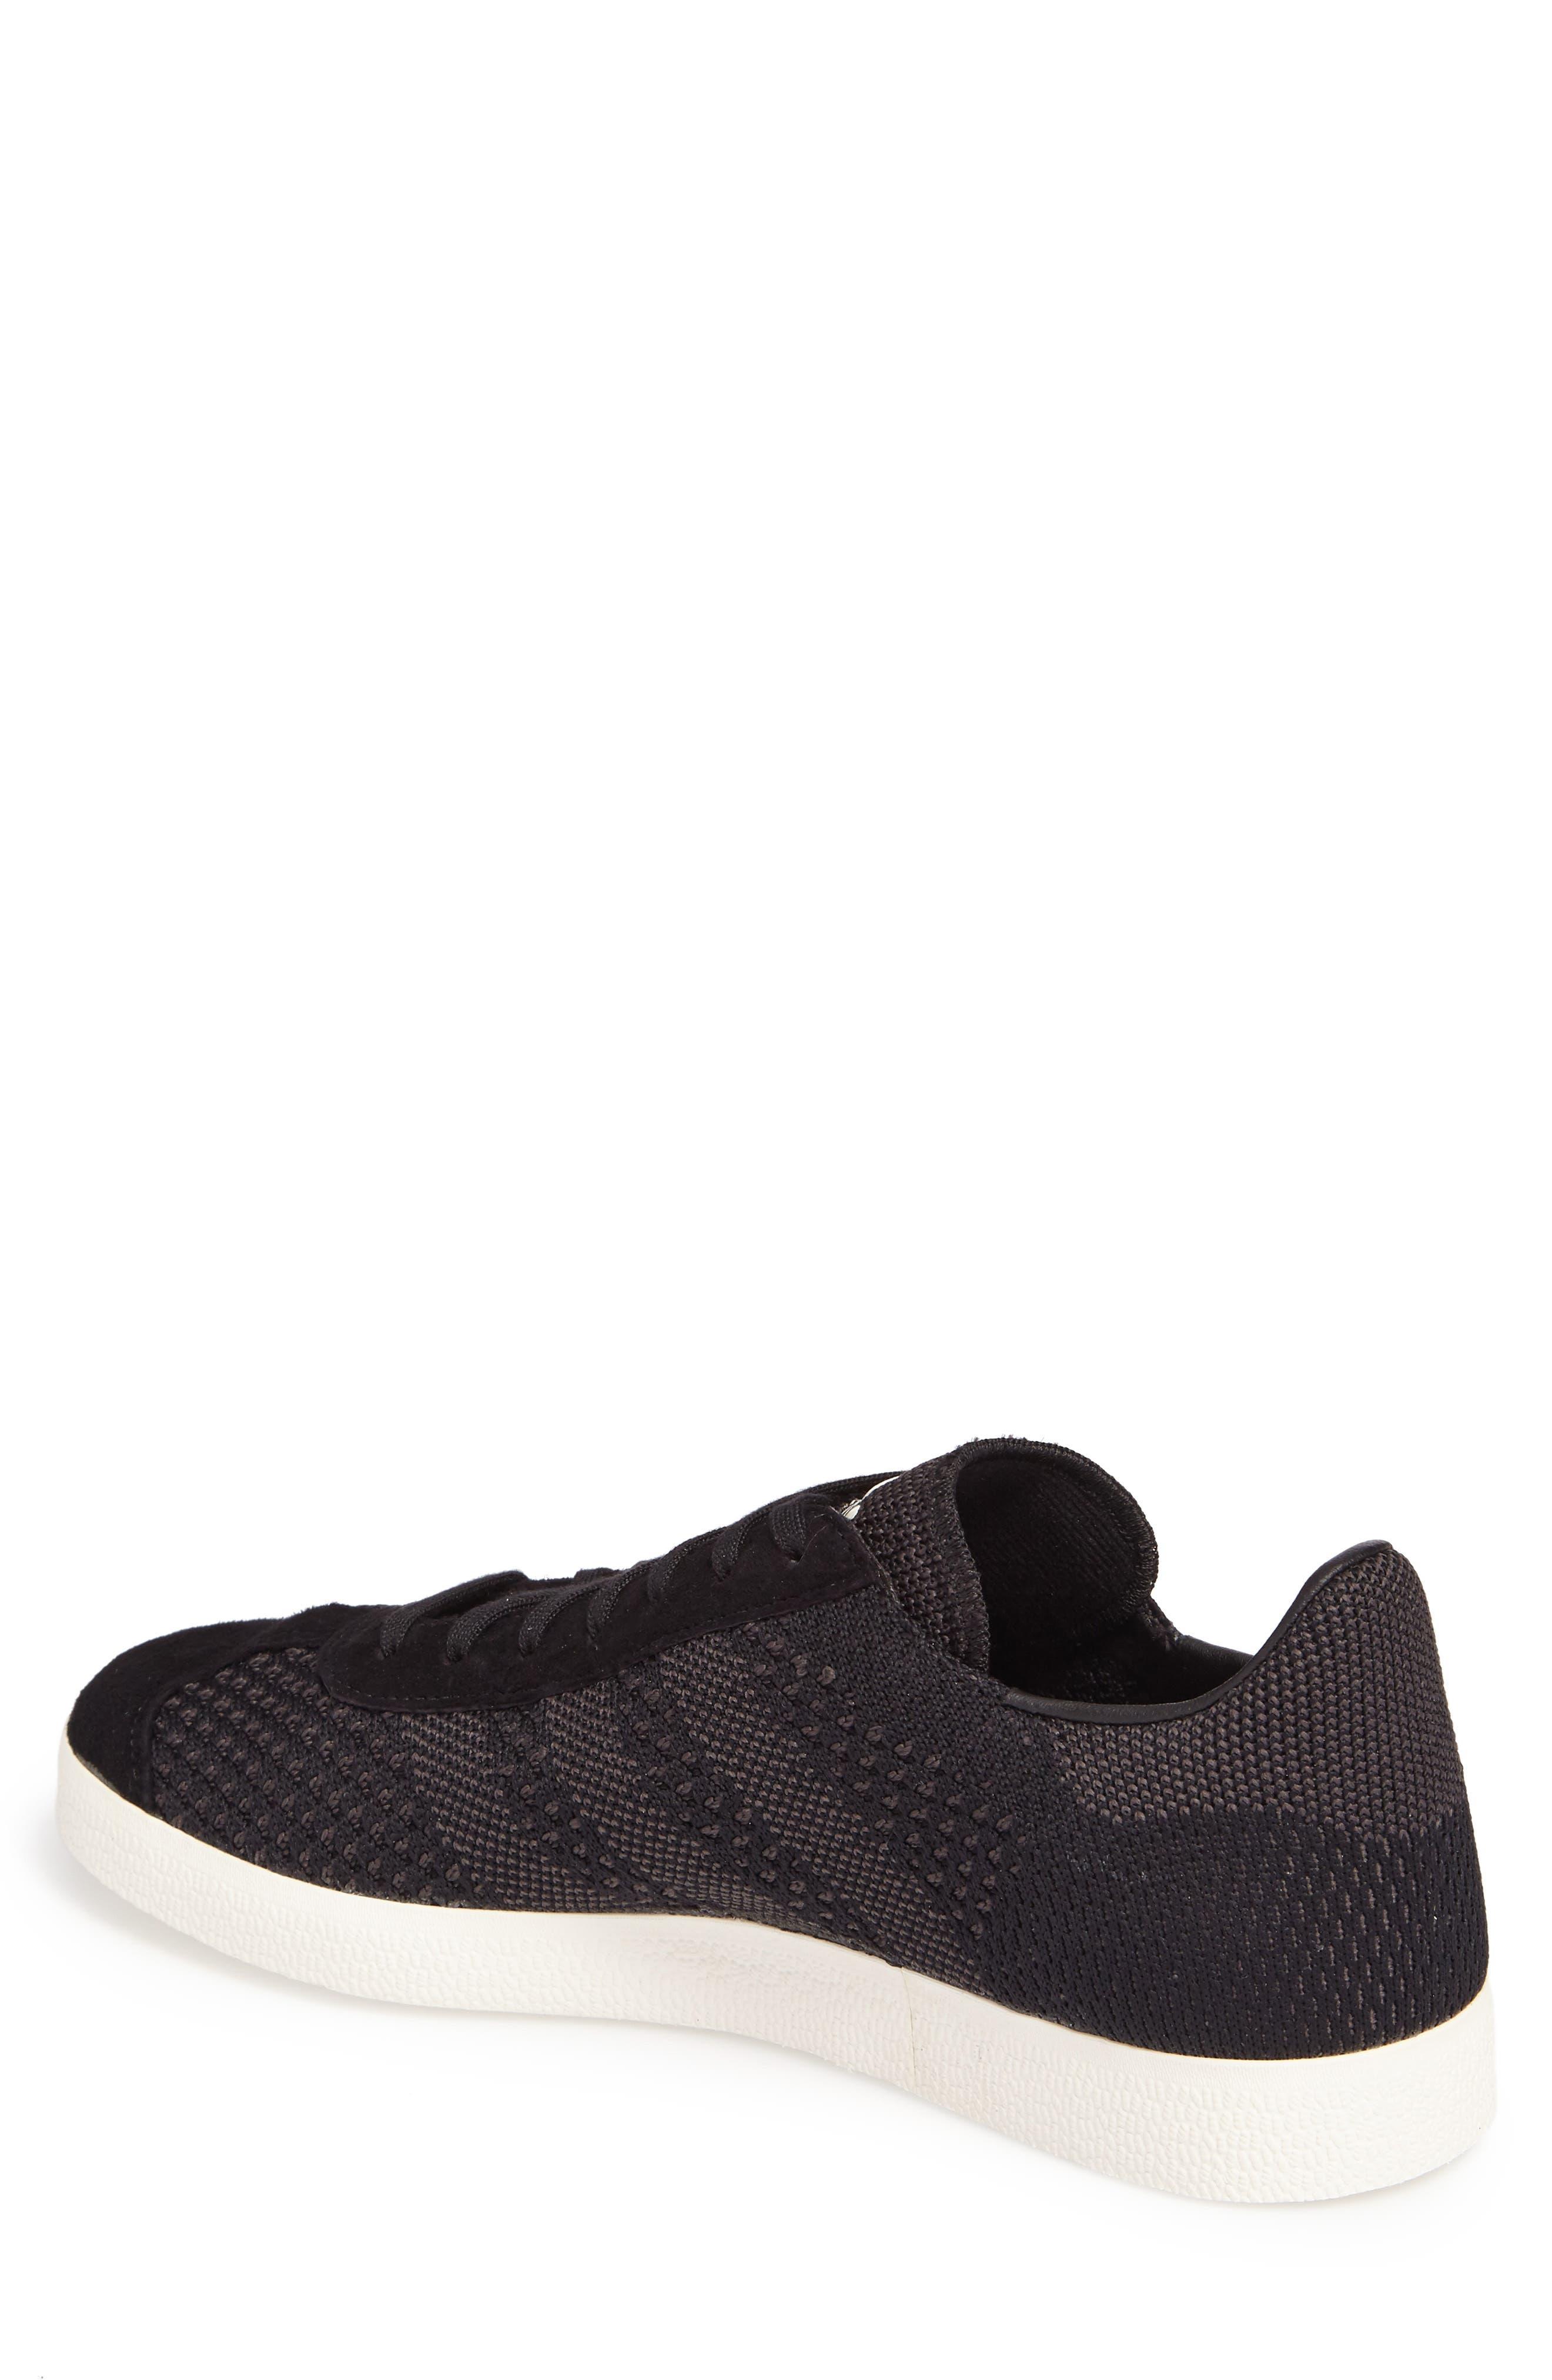 Gazelle Primeknit Sneaker,                             Alternate thumbnail 2, color,                             001